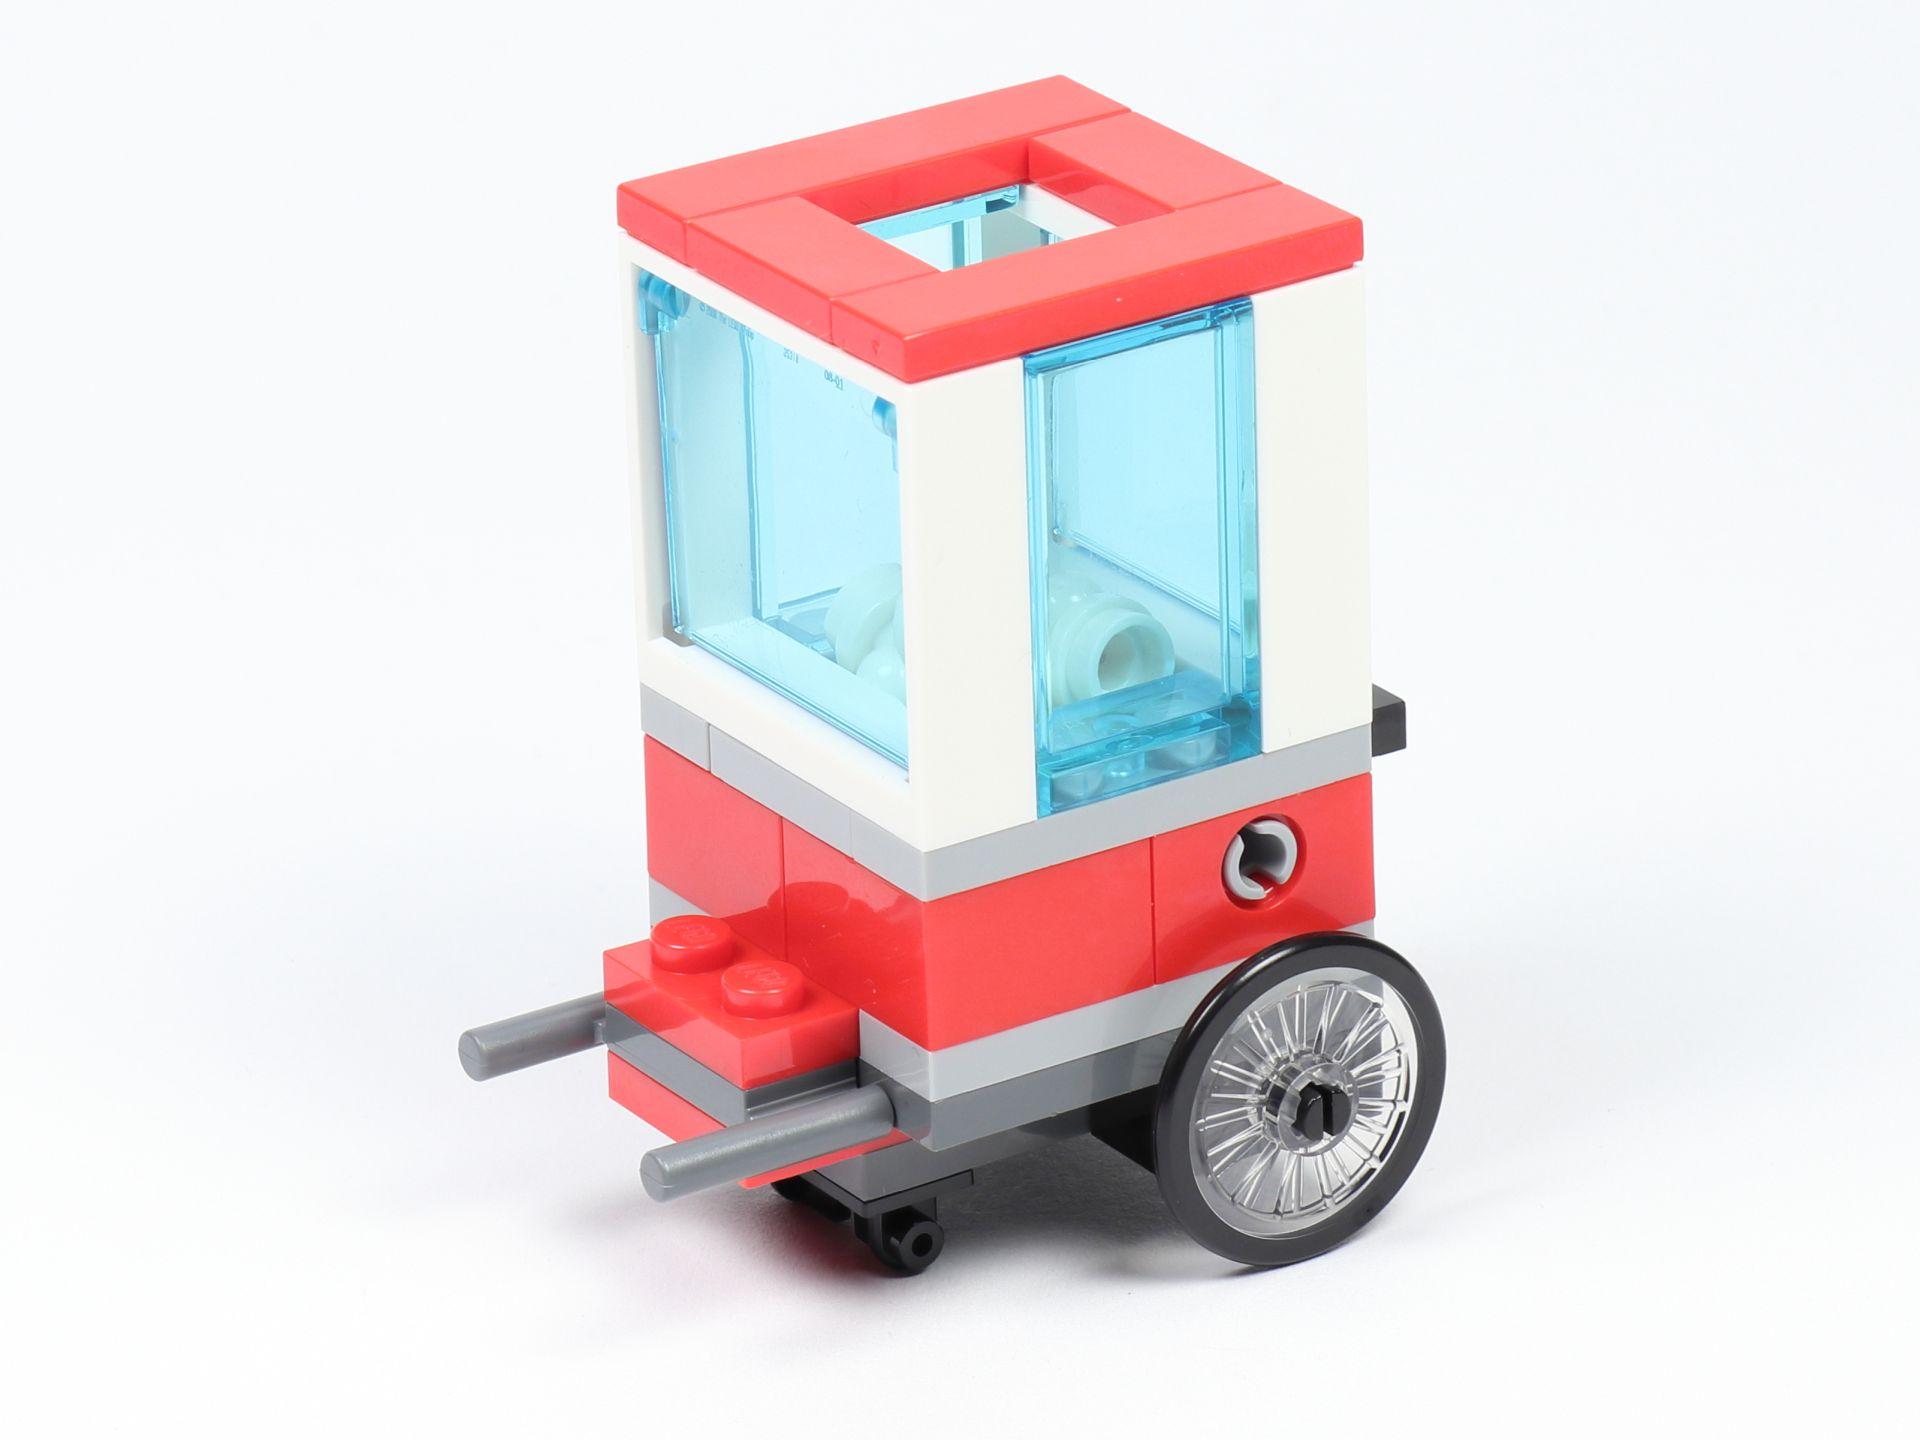 Popcorn Stand Cart Verkäufer Pop Corn Polybag LEGO City 30364 Popcorn Wagen